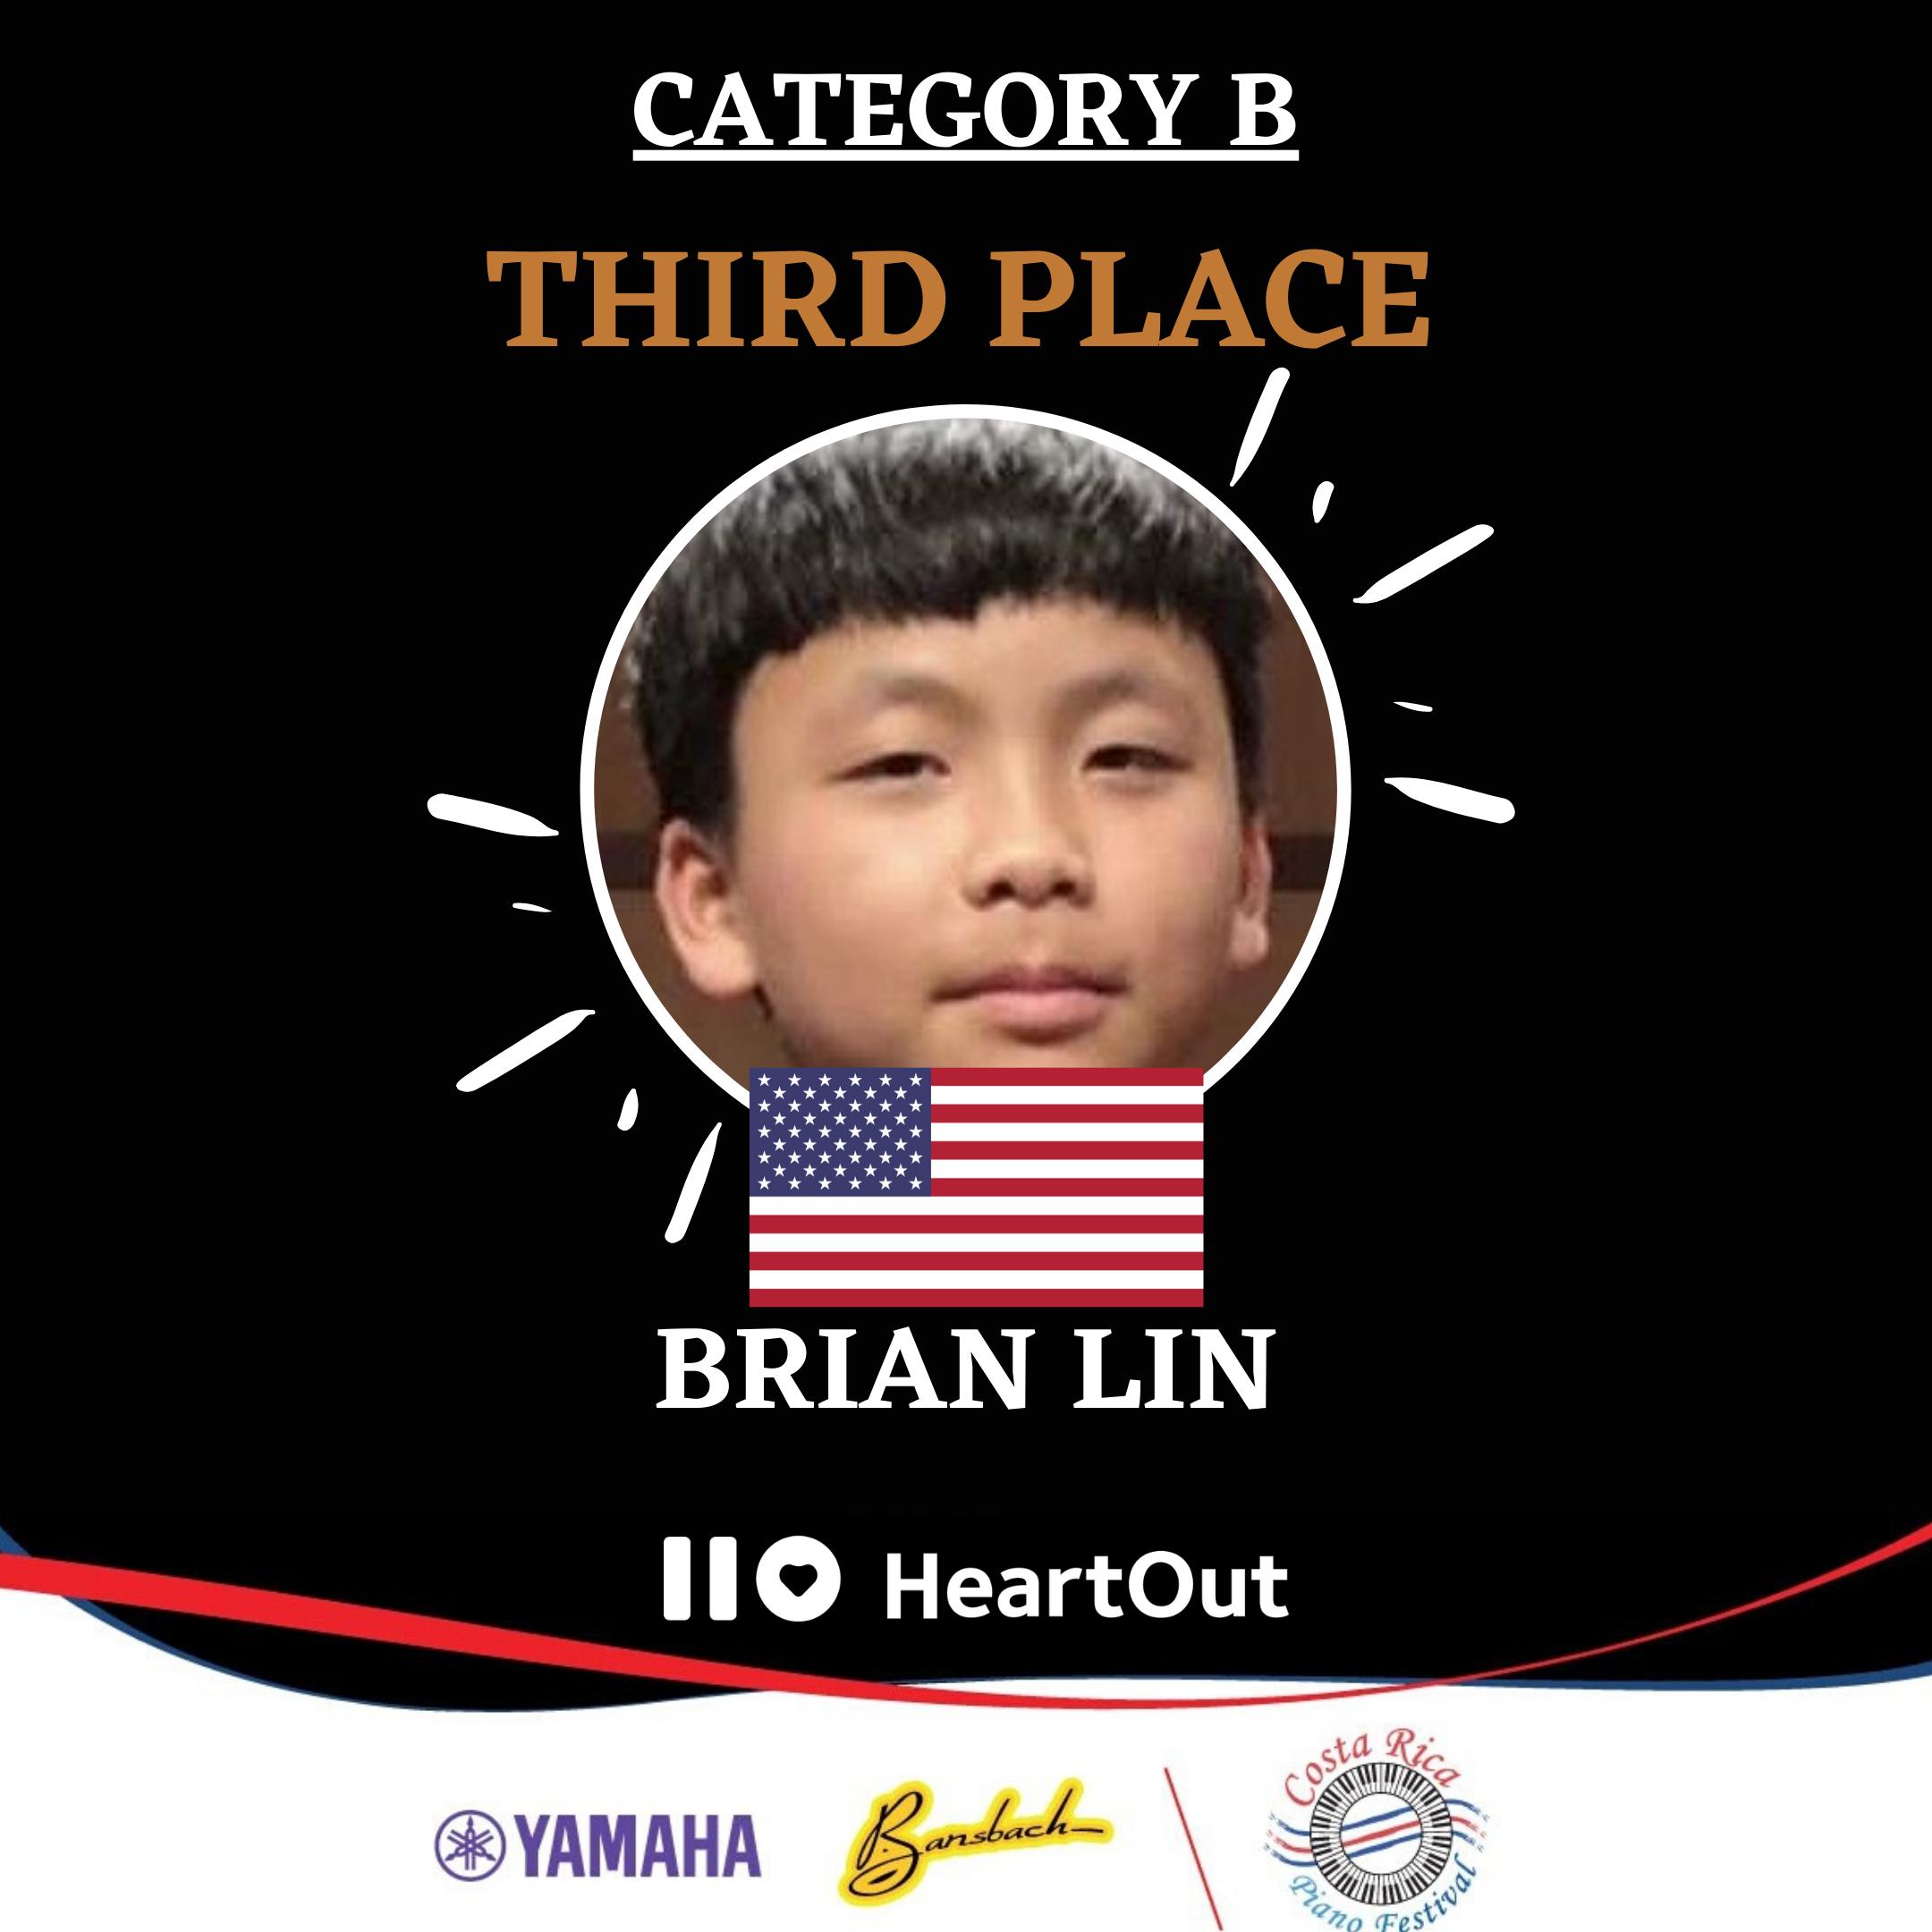 CRPF Brian Lin